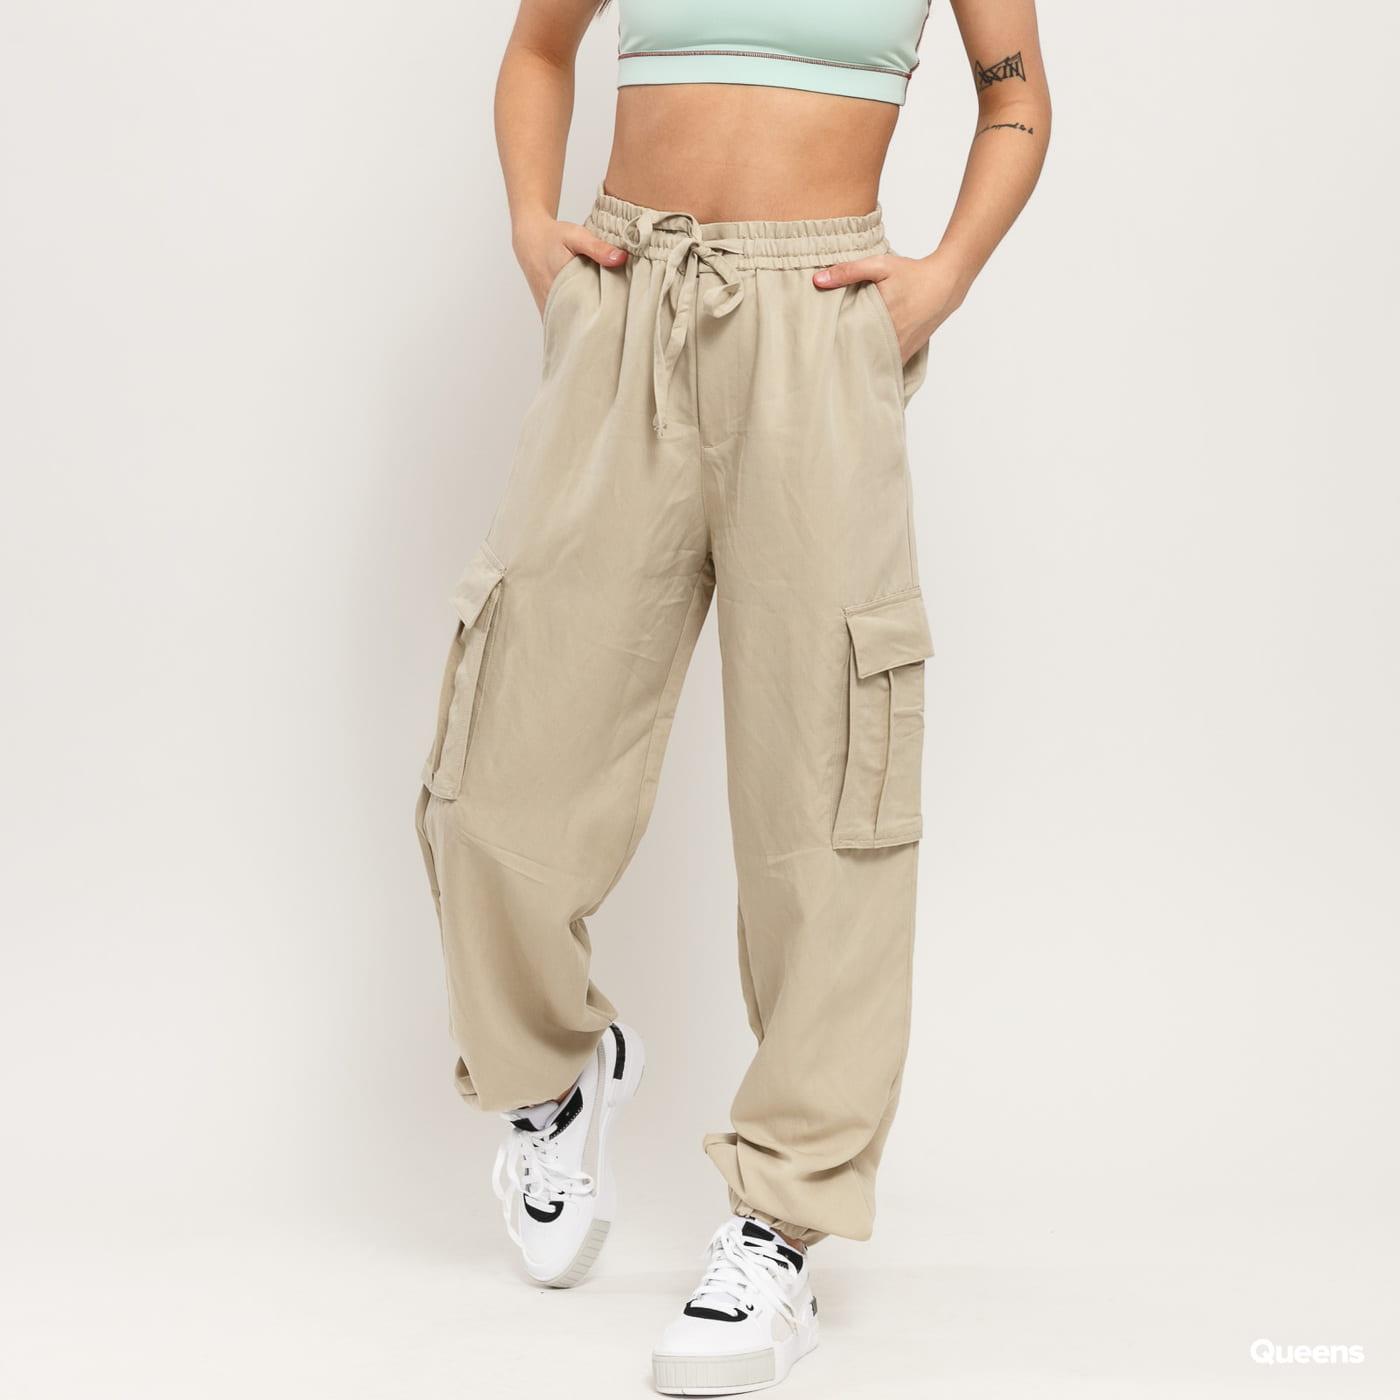 Urban Classics Ladies Viscose Twill Cargo Pants béžové